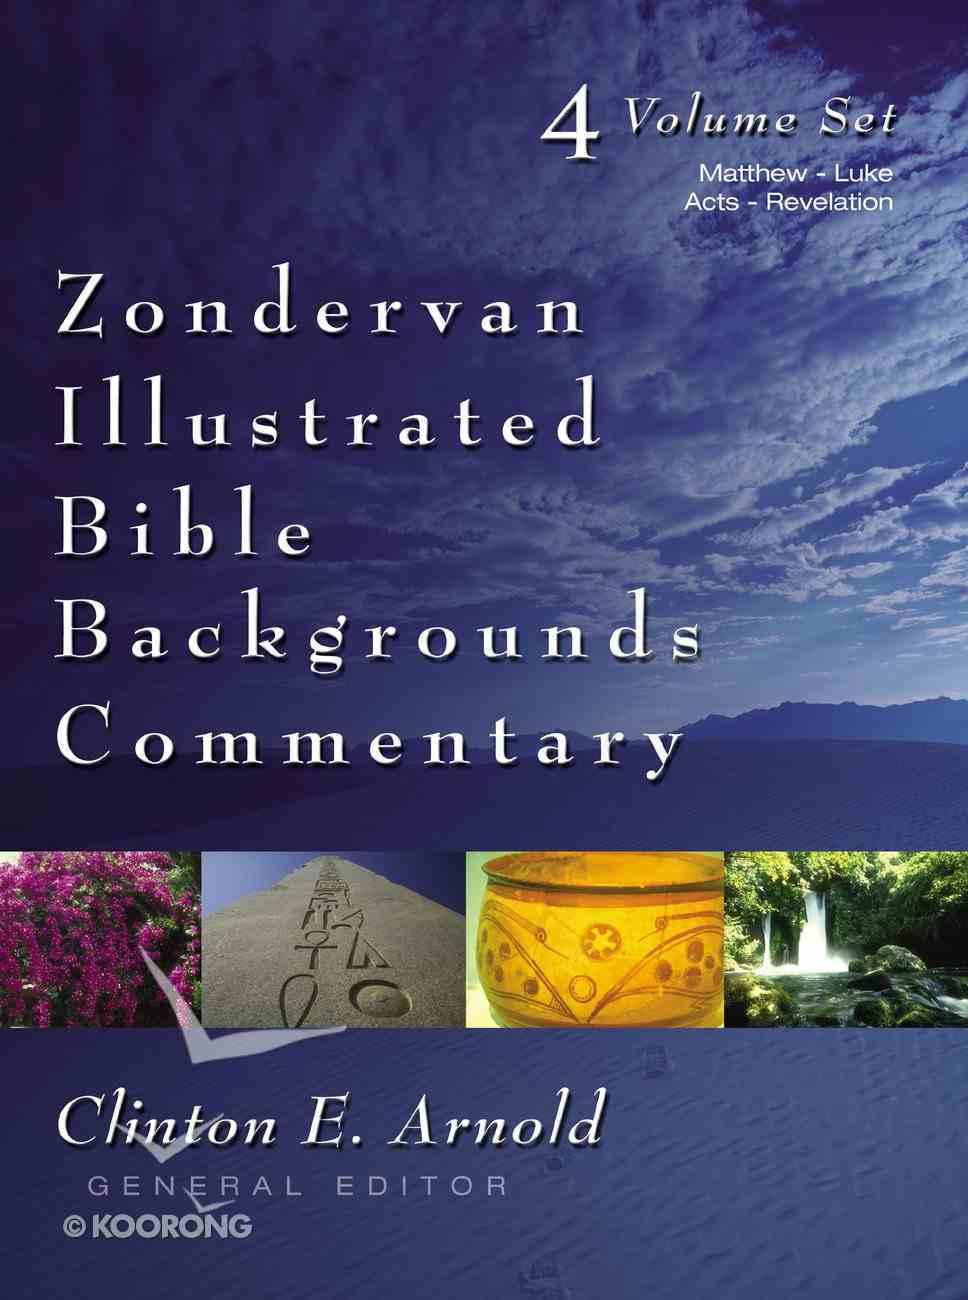 Matthew-Luke; Acts-Revelation (2 Volume Set) (Zondervan Illustrated Bible Backgrounds Commentary Series) Hardback